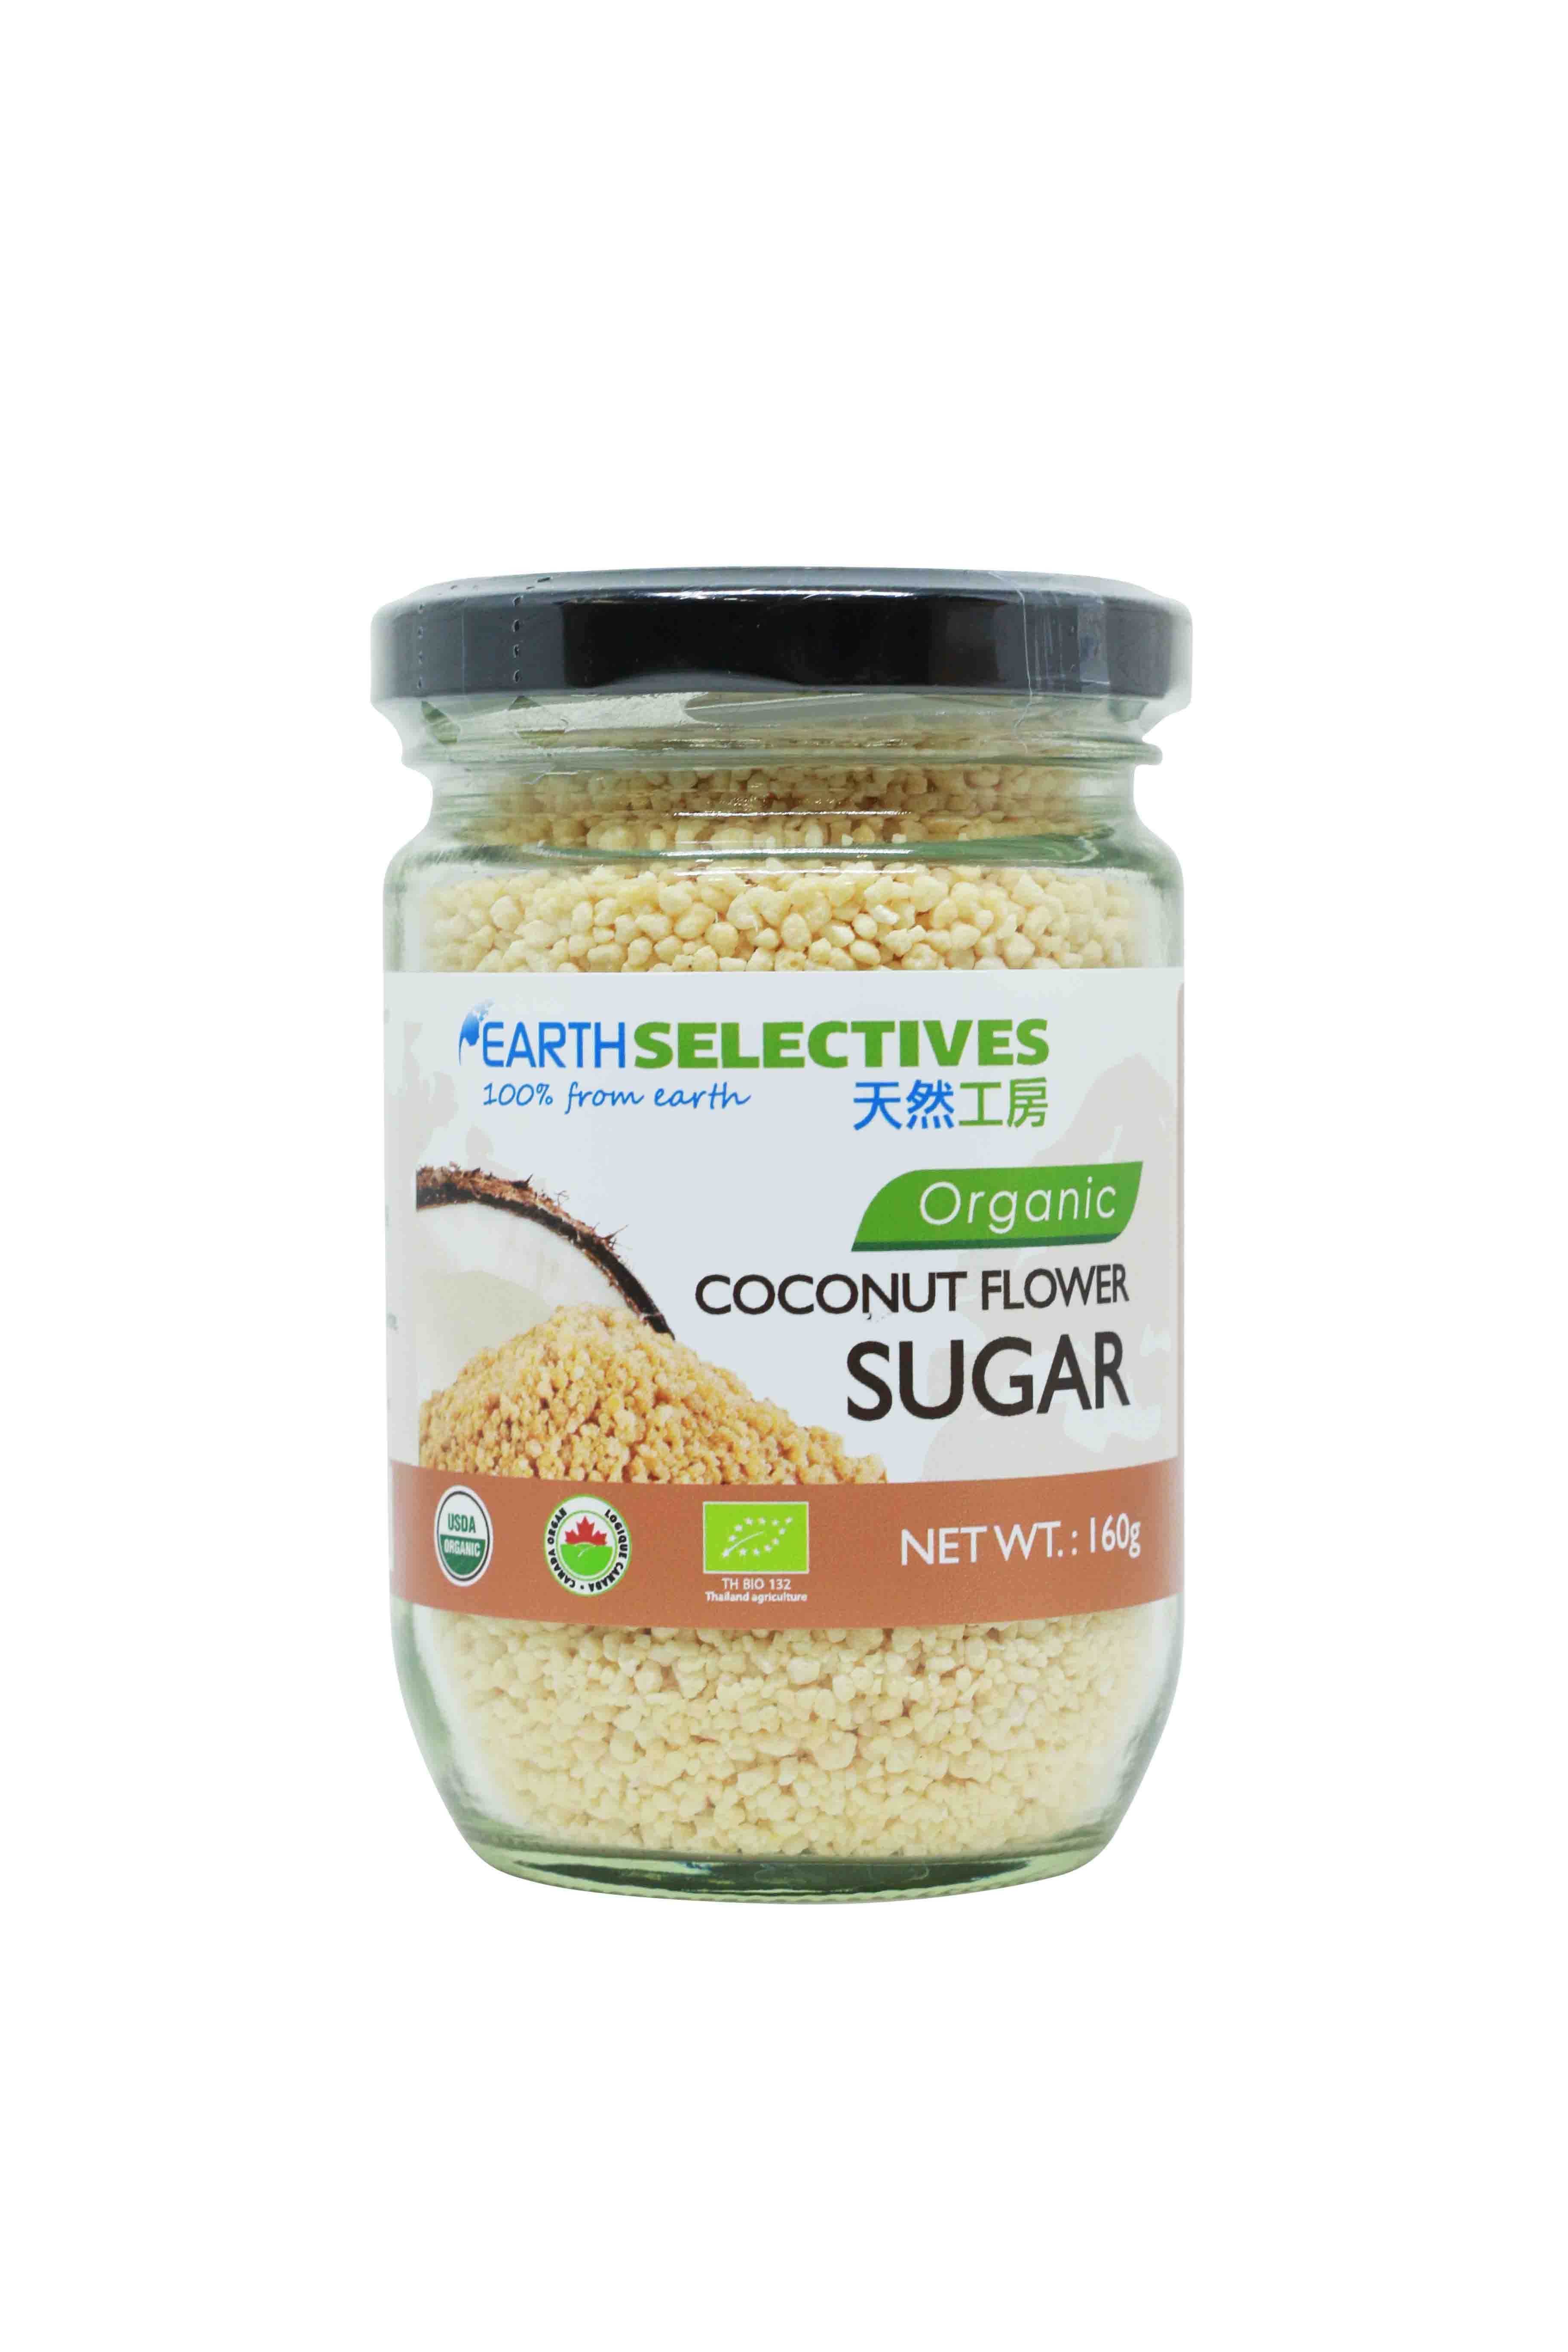 Earth Selectives Organic Virgin Coconut Flower Sug